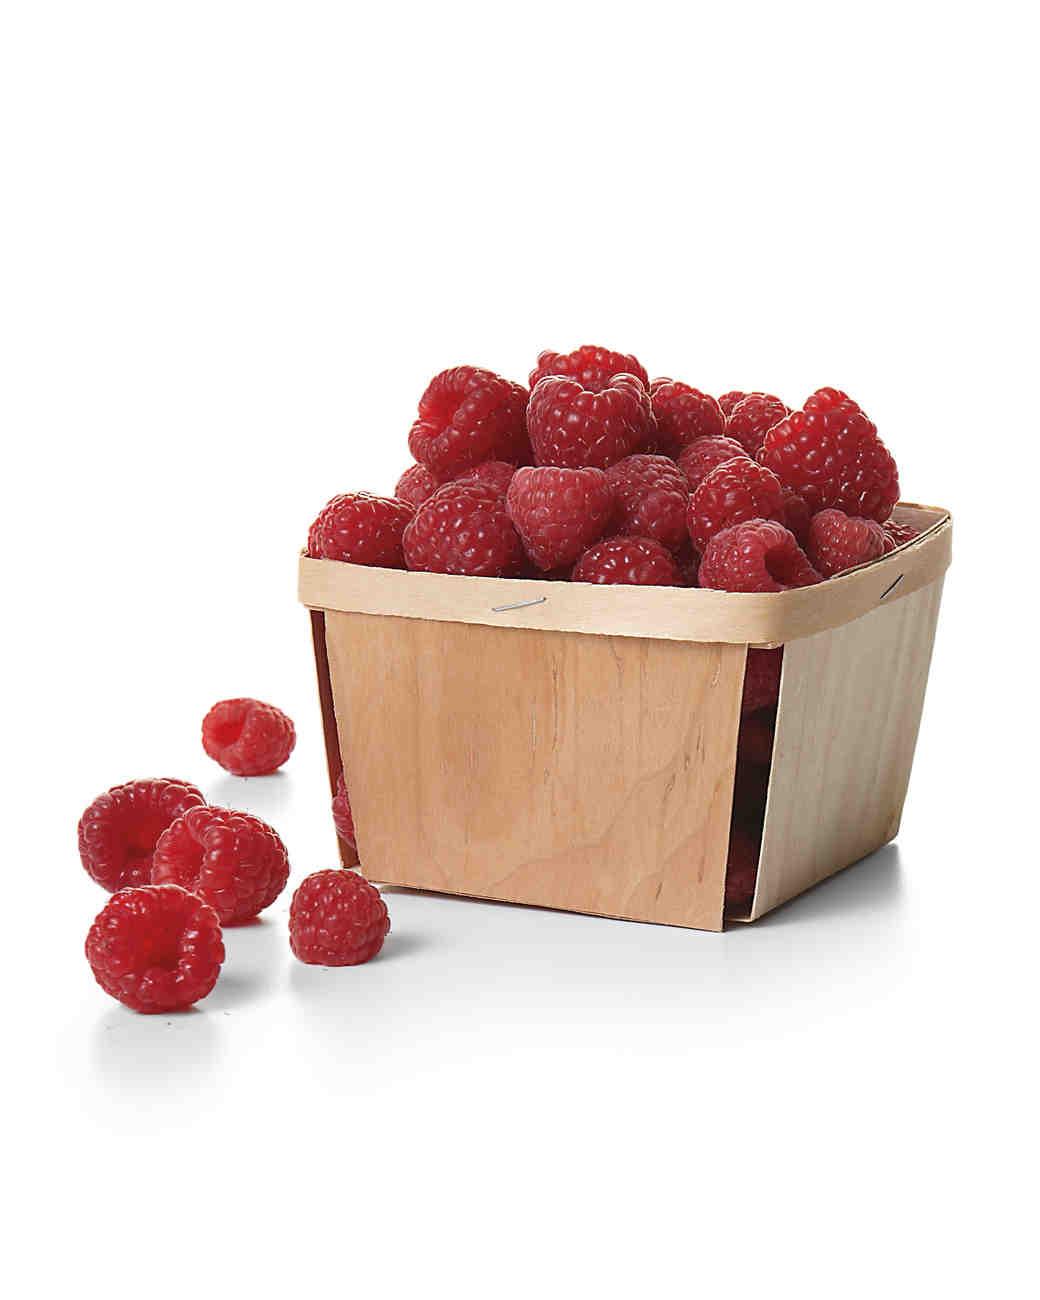 raspberries-025-mwd109728.jpg